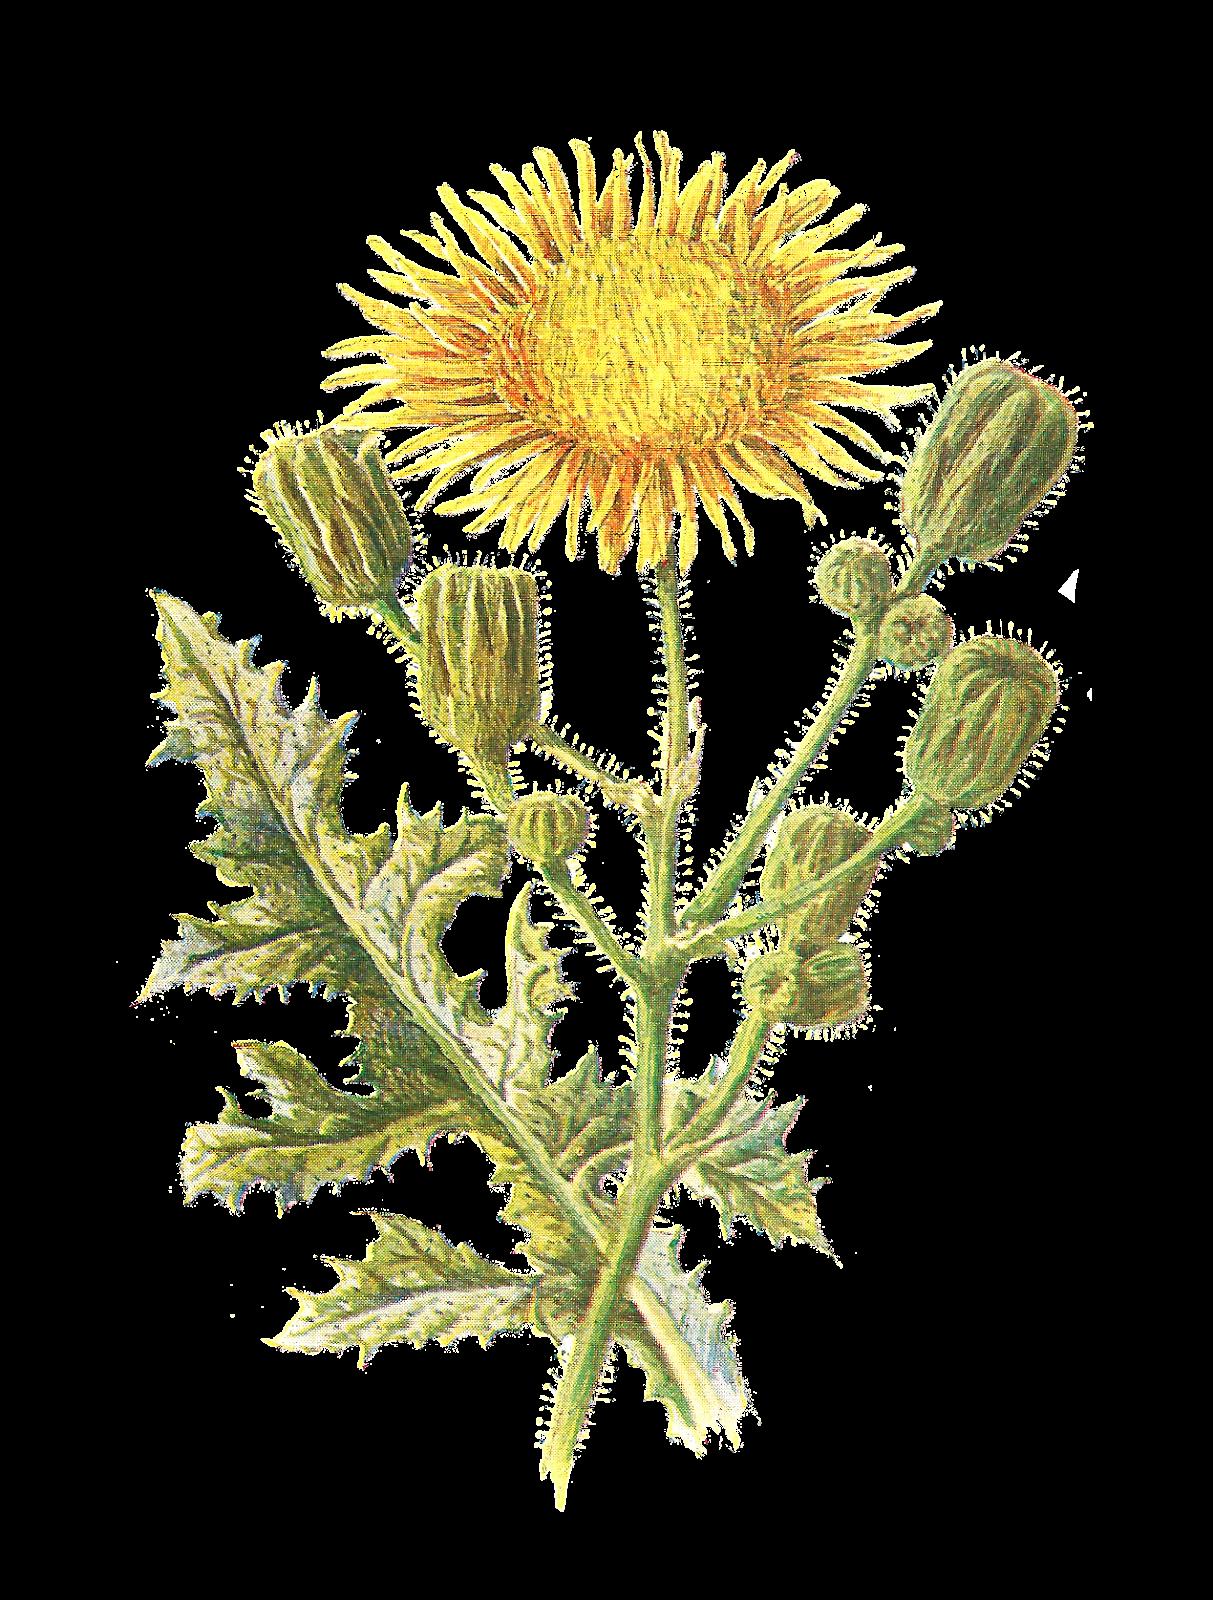 Dandelion clipart wildflower. Antique images vintage scrapbooking